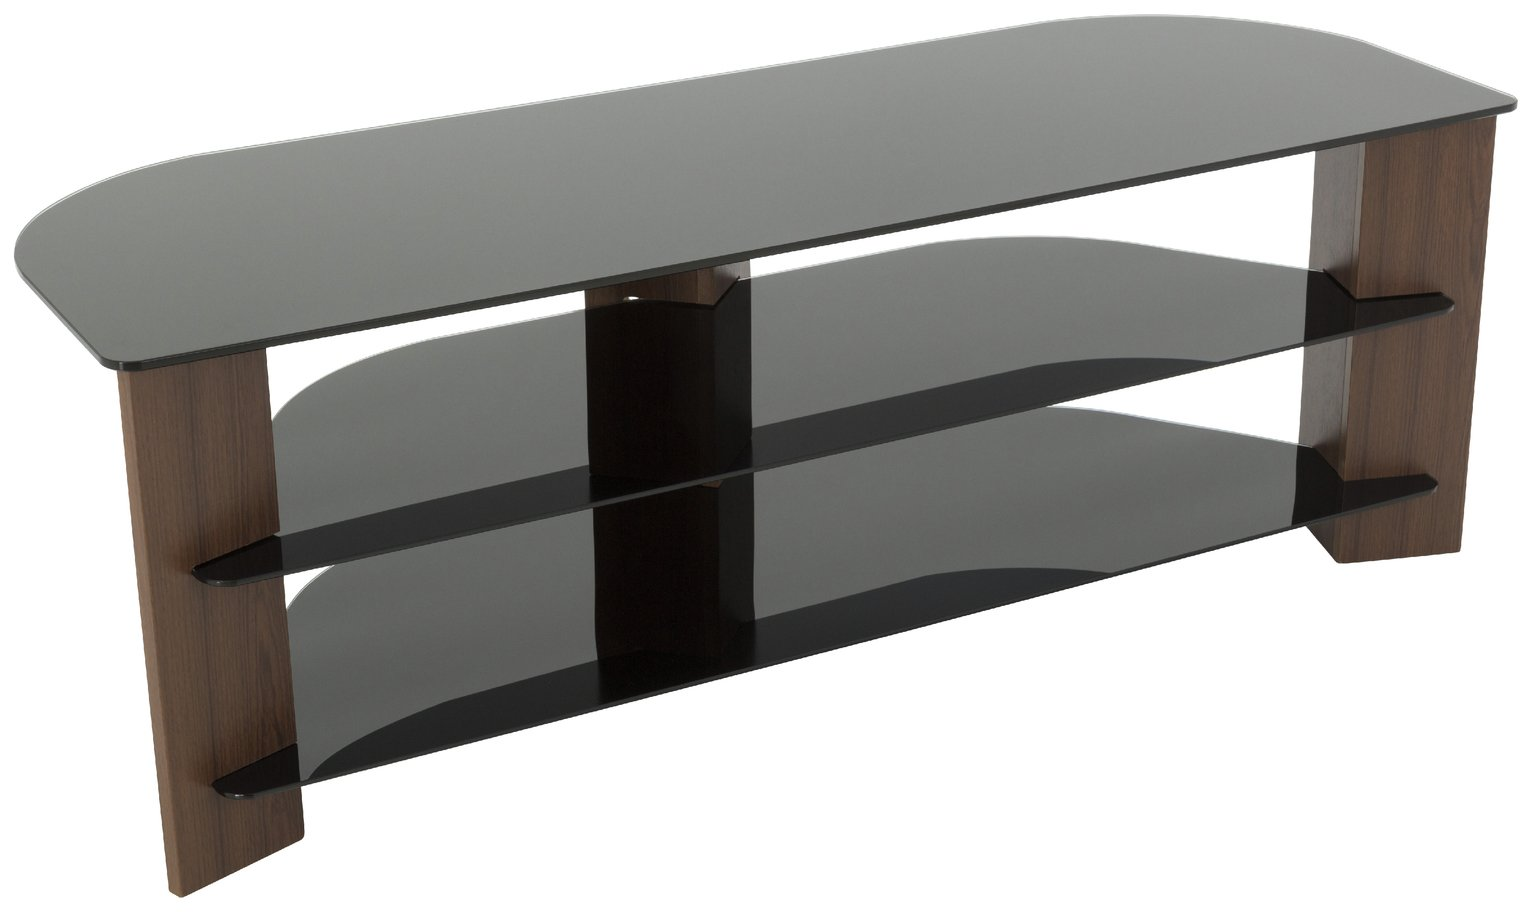 AVF Wood Effect up to 65 Inch TV Corner Stand - Walnut